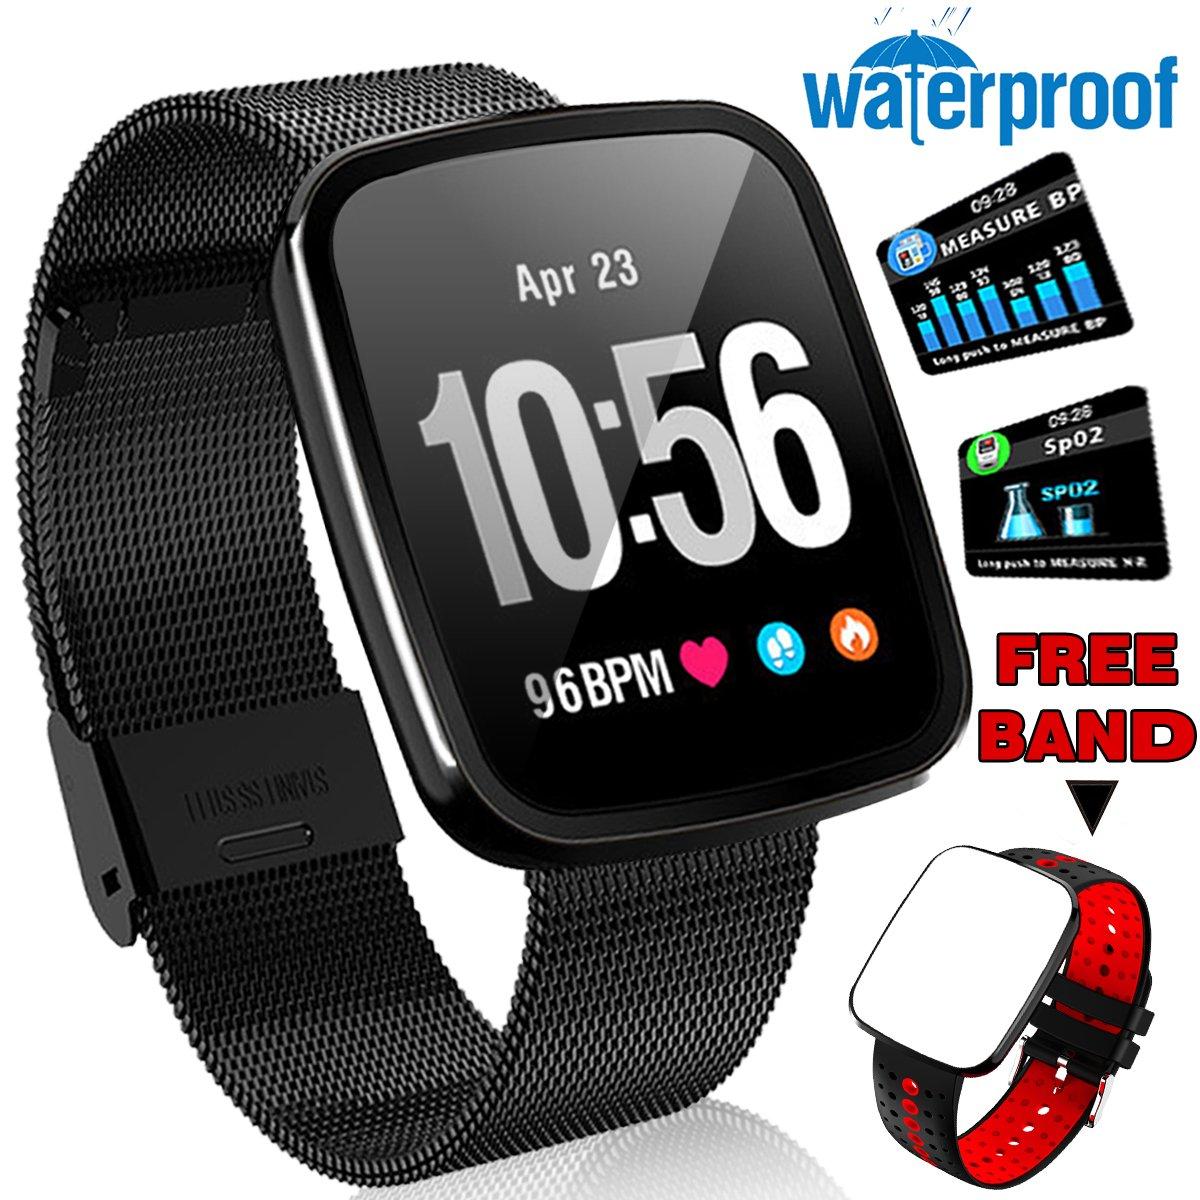 ONMet SmartWatch Fitness Tracker IP67 Waterproof with Heart Rate Blood Pressure Monitor Men Women Swim Run Outdoor Sport Watch GPS Activity Tracker Pedometer Calorie Stopwatch IOS Android